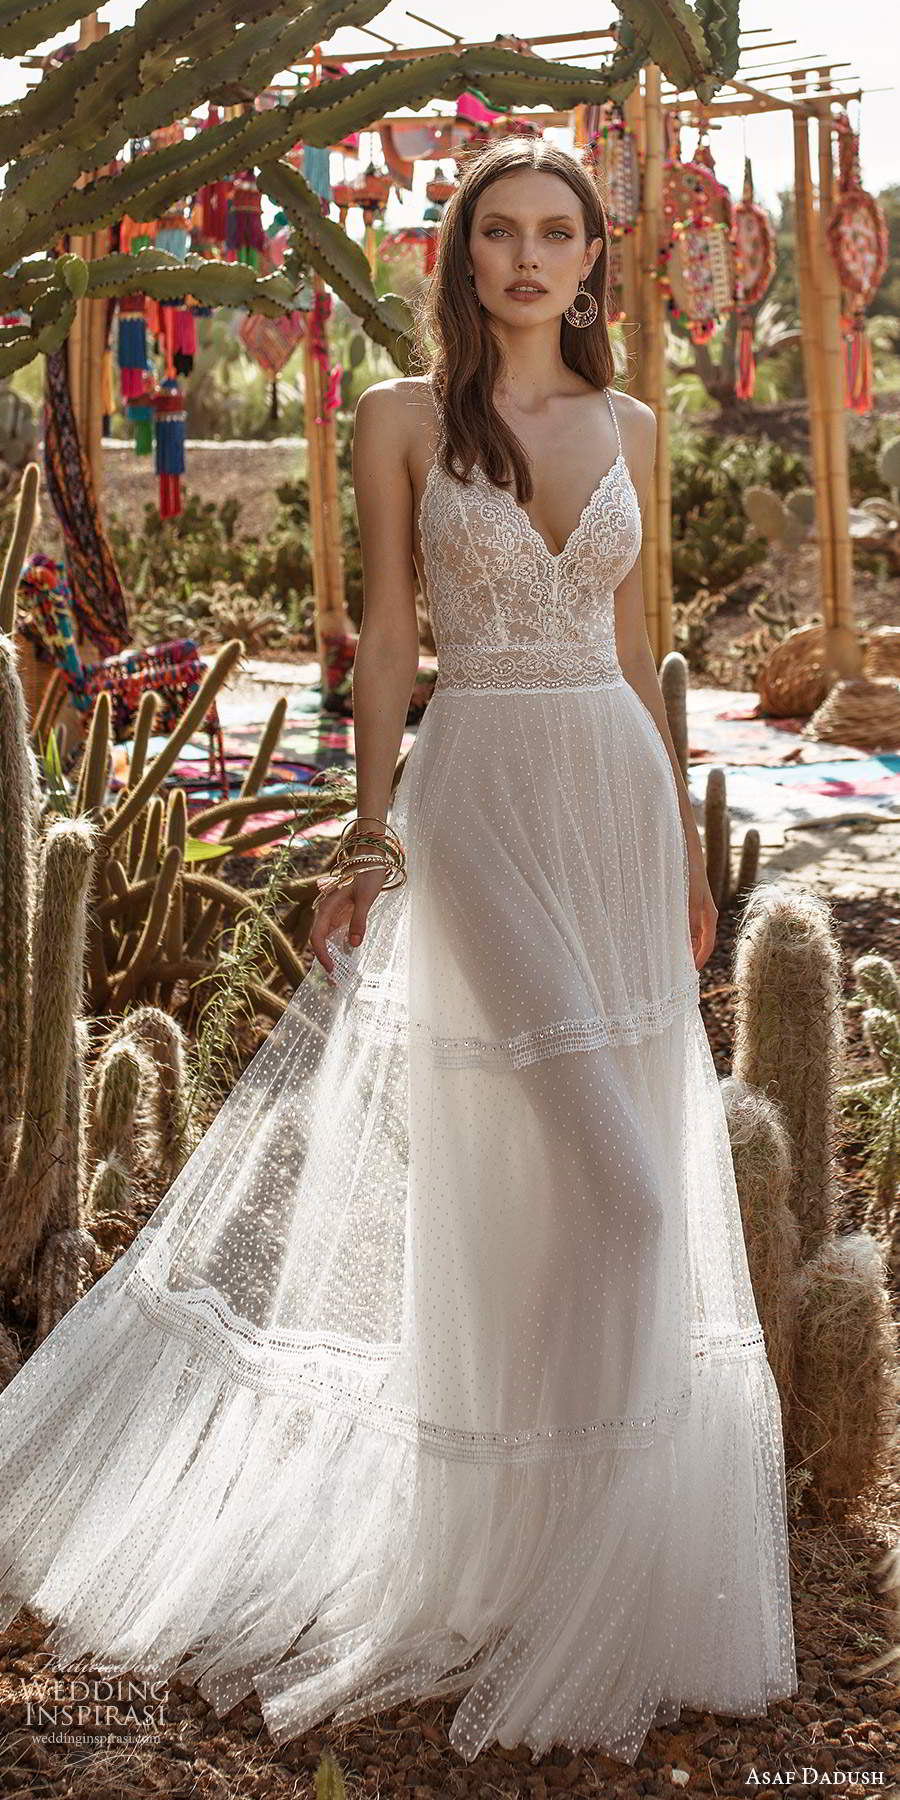 asaf dadush 2020 bridal sleeveless thin beaded straps sweetheart neckline fully embellished a line wedding dress low back (6) mv